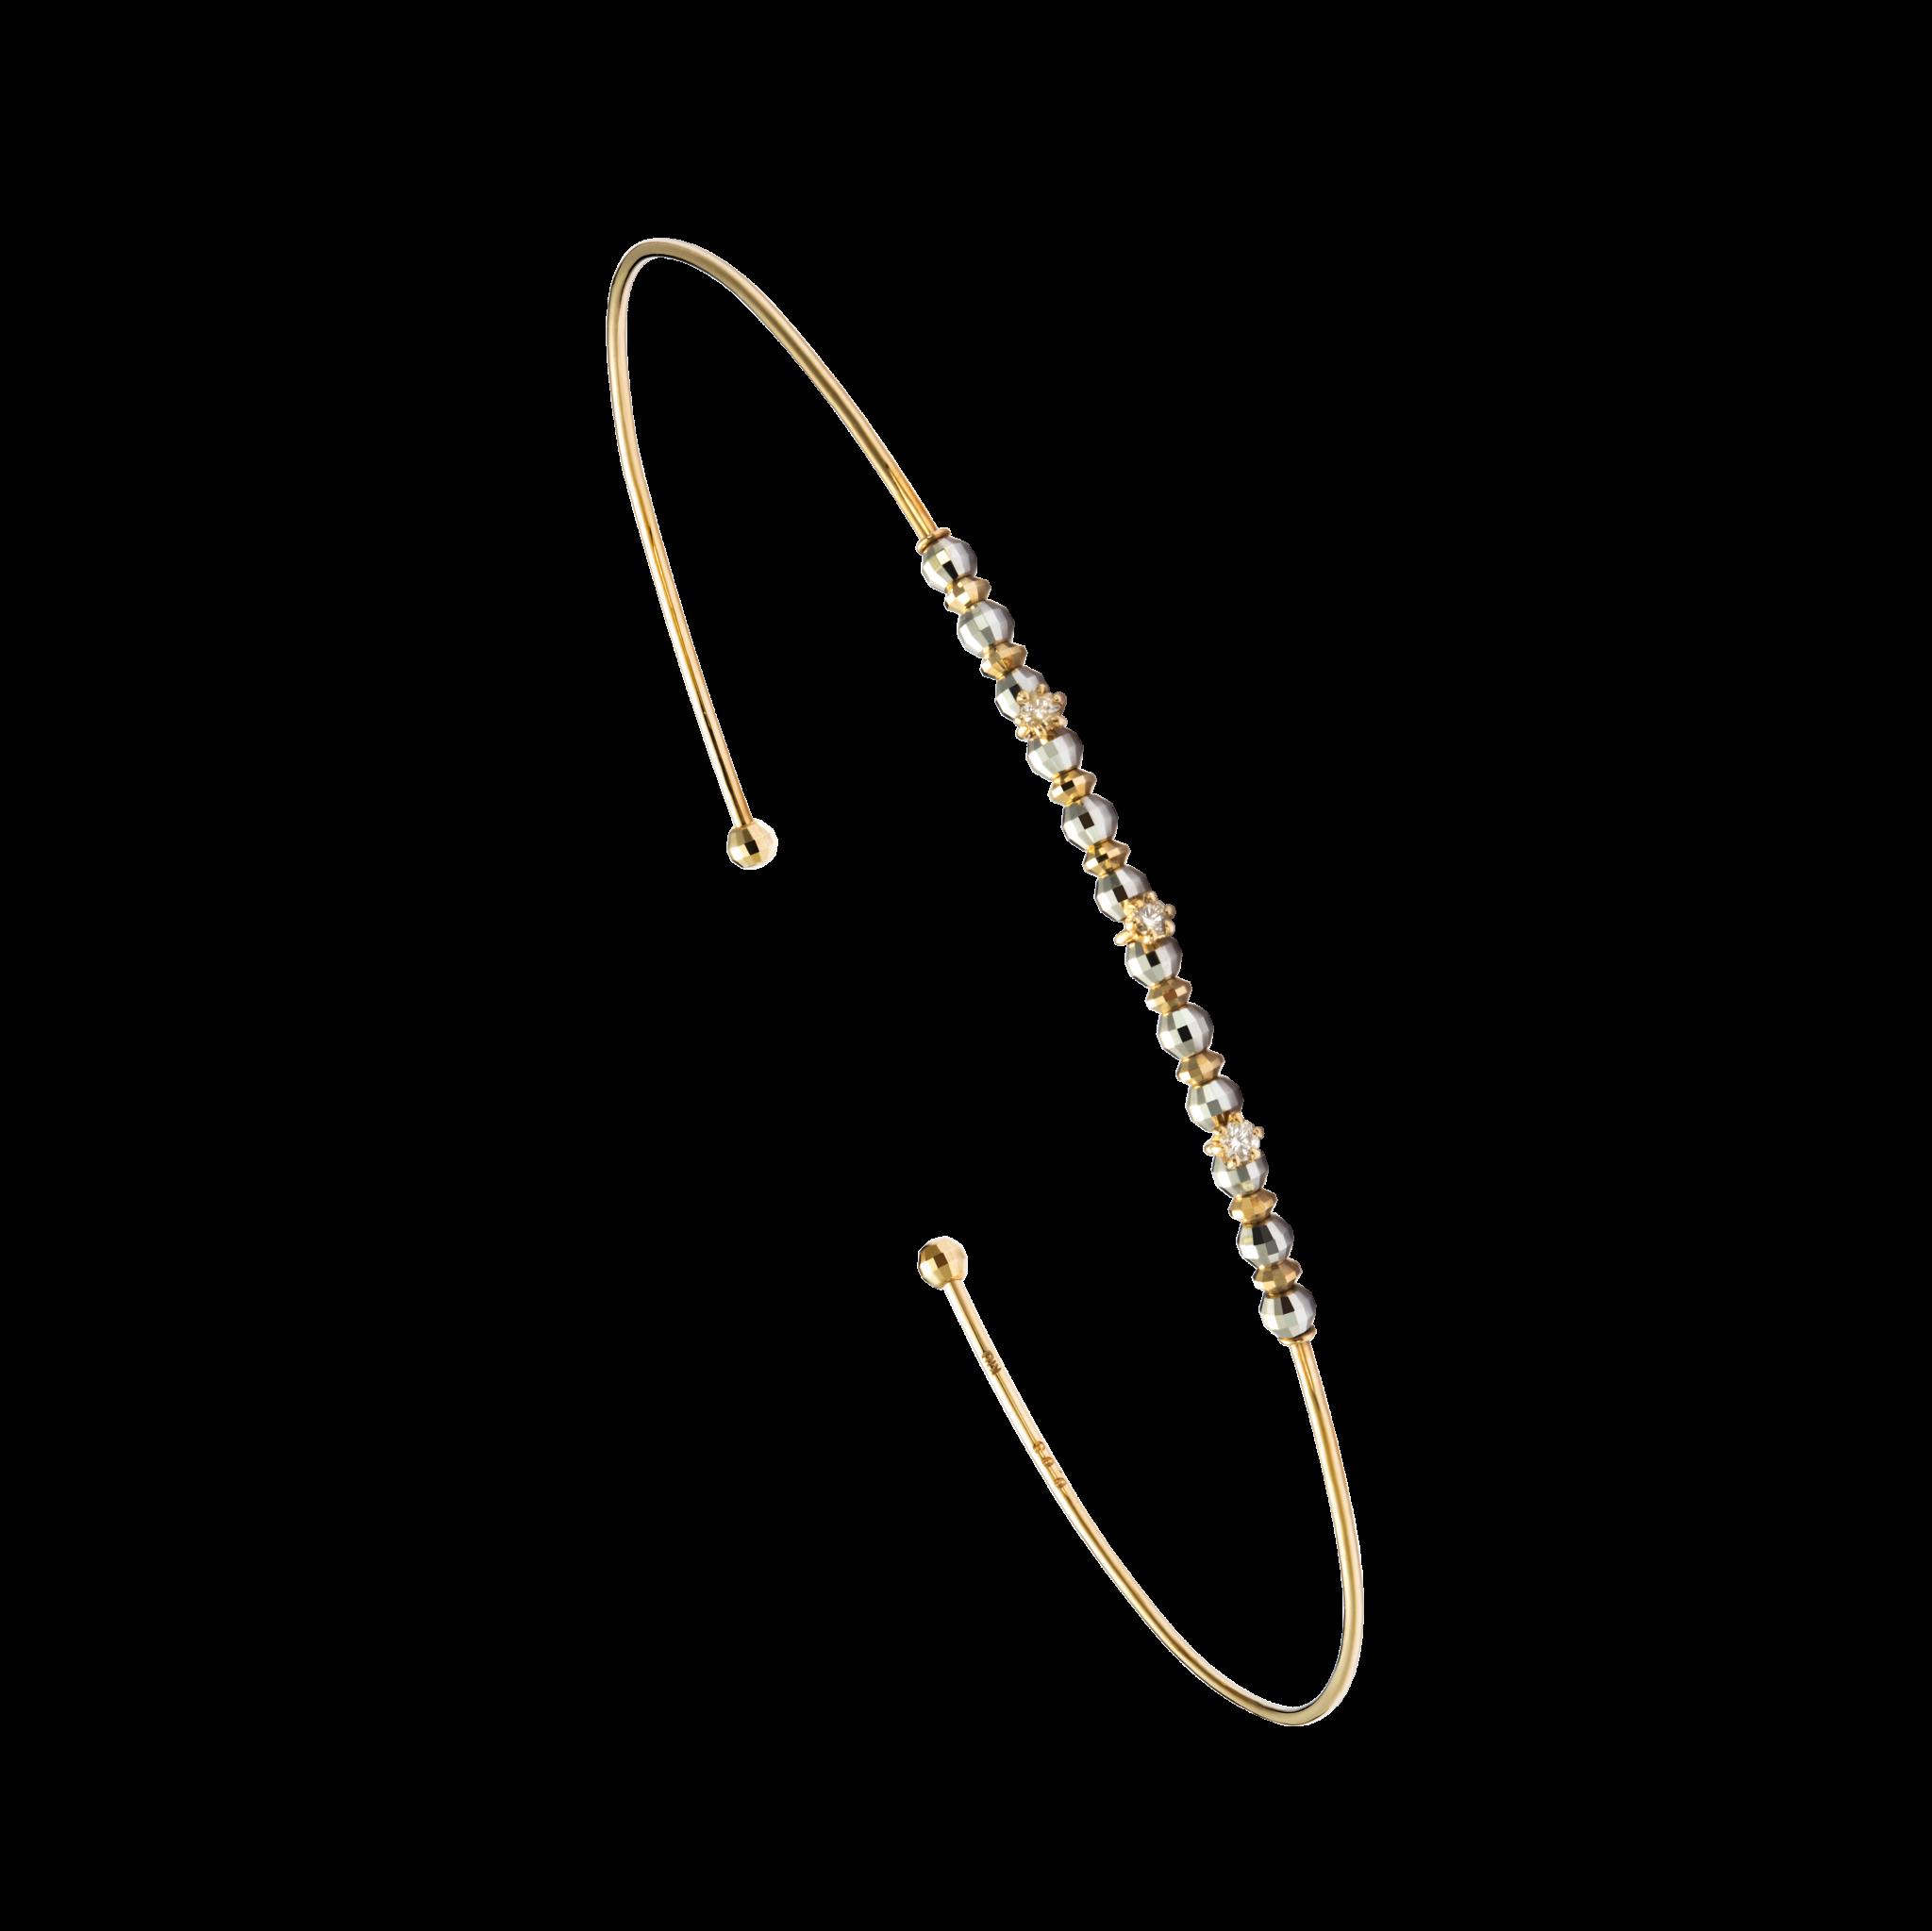 Honey Ball Collection10K黄金 串双色珠镶钻手镯 2399